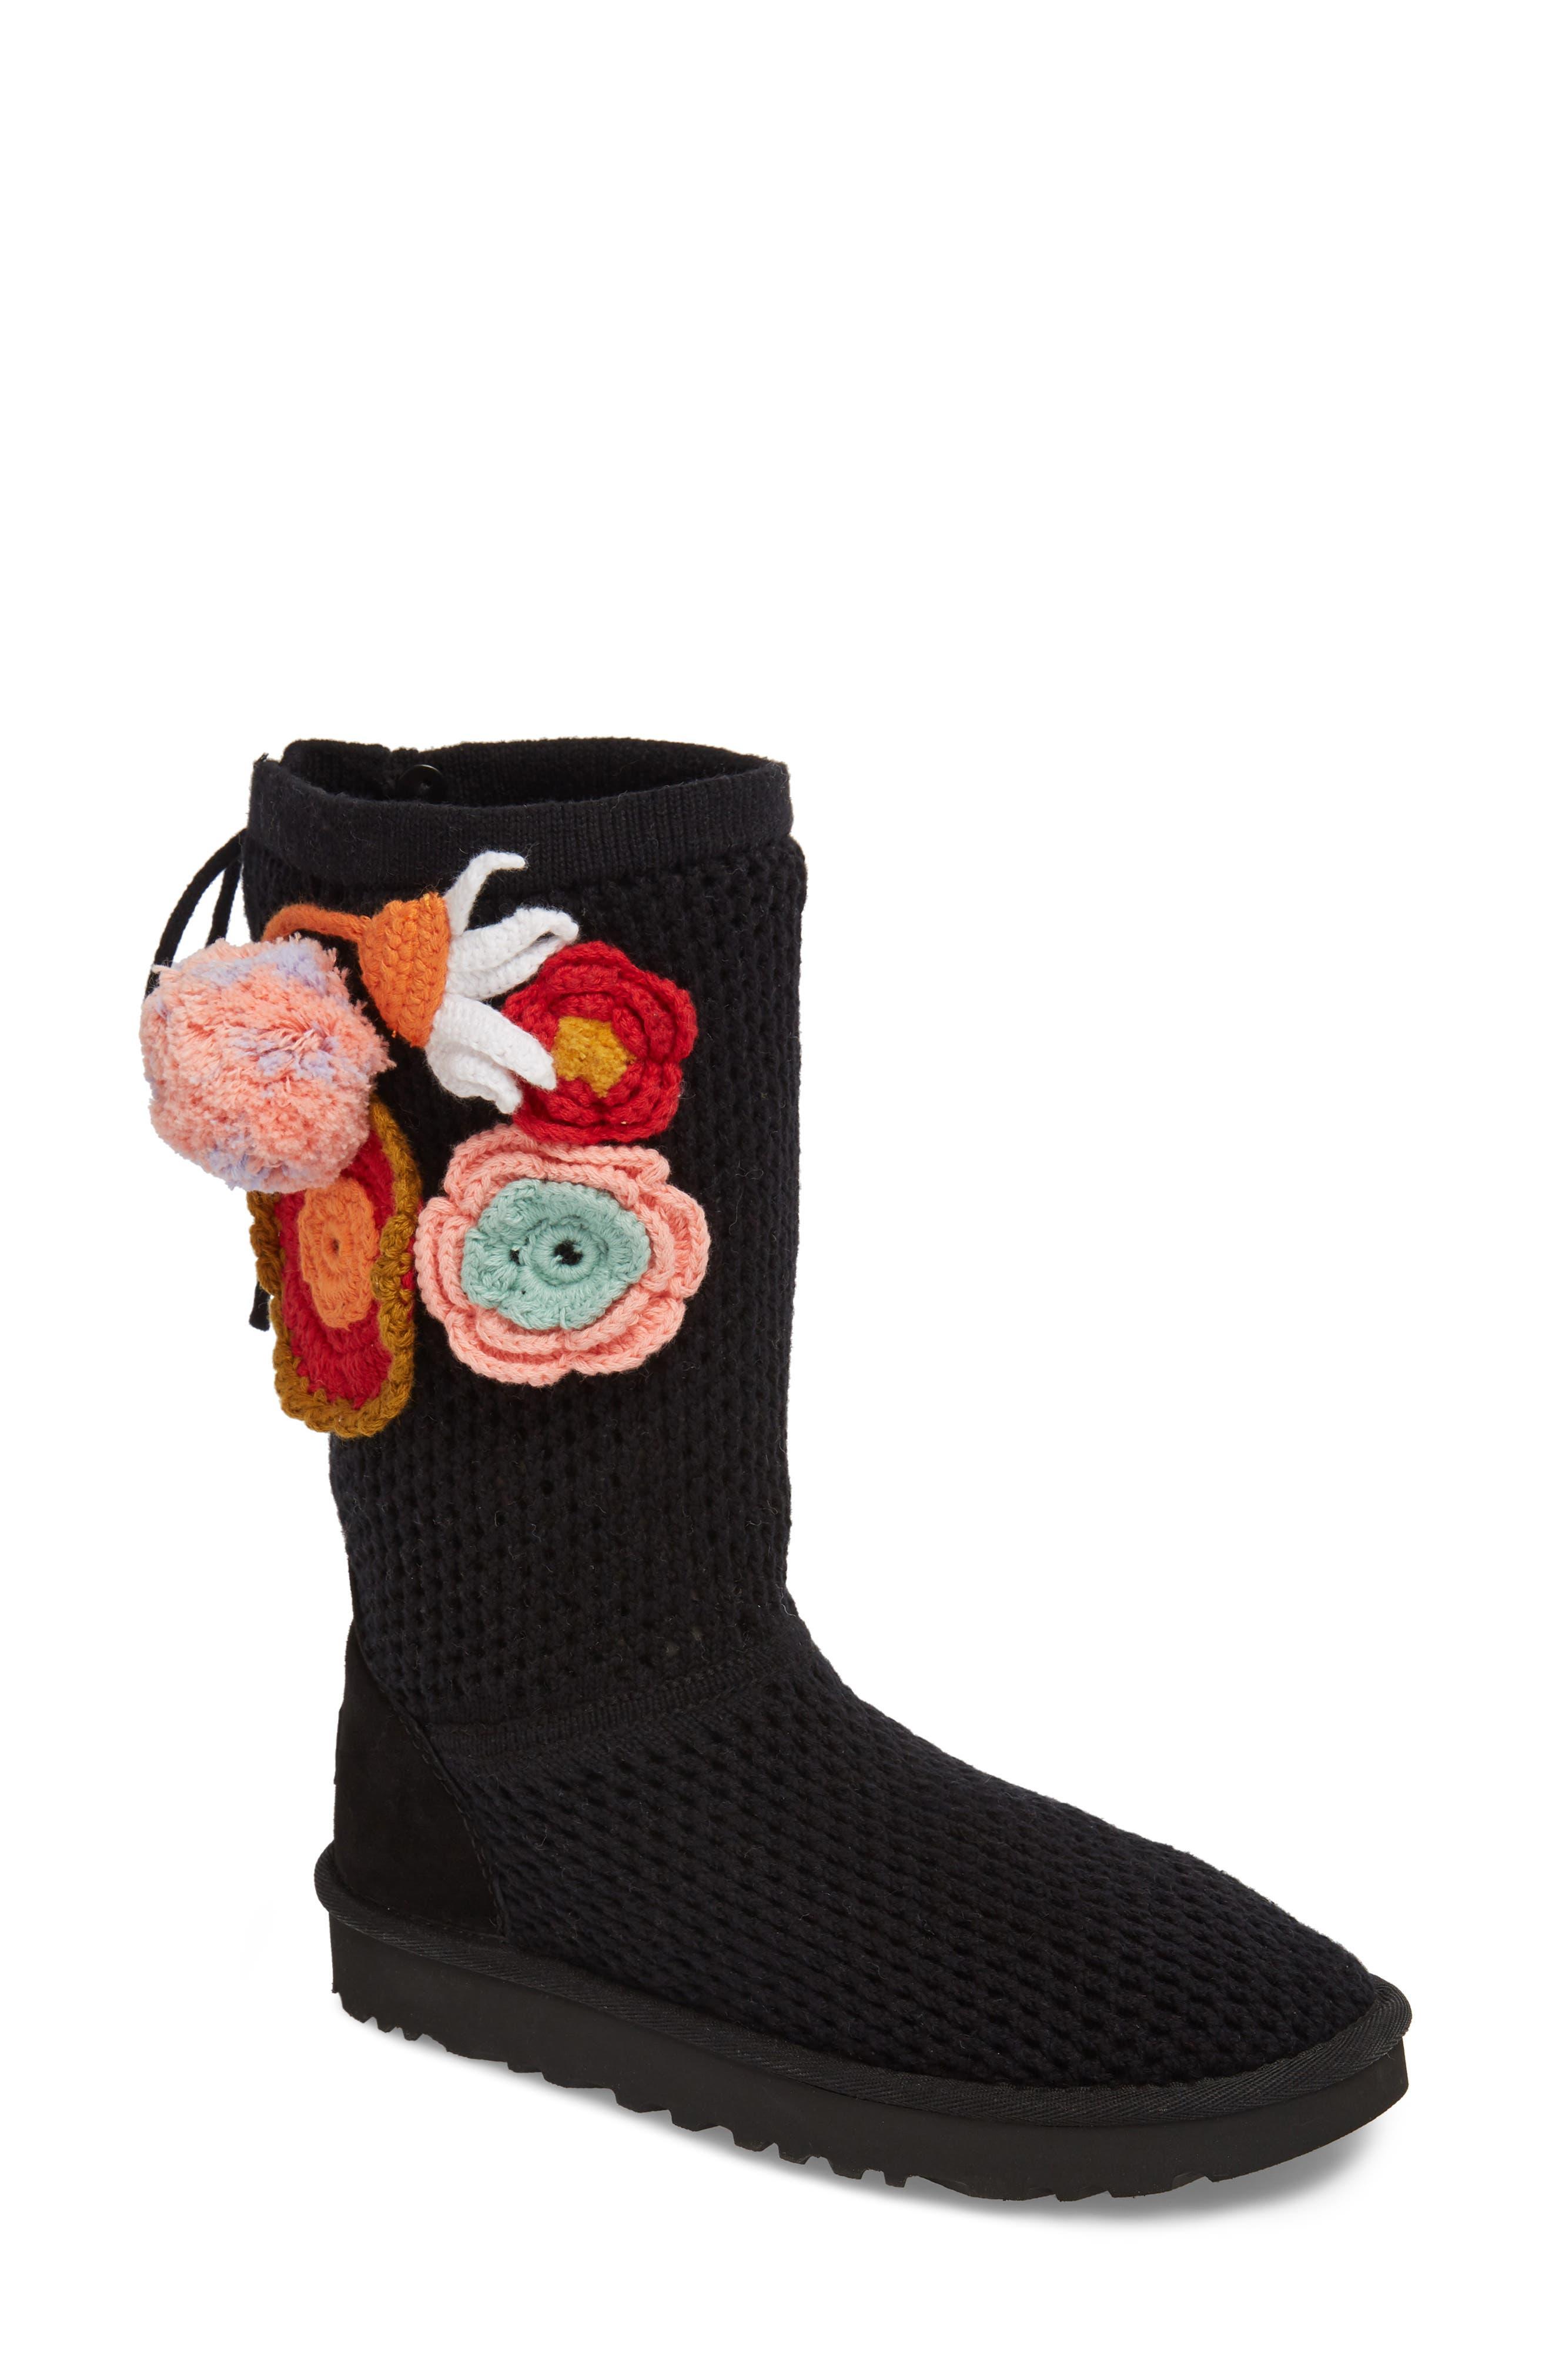 Crochet Classic Tall Boot,                         Main,                         color,